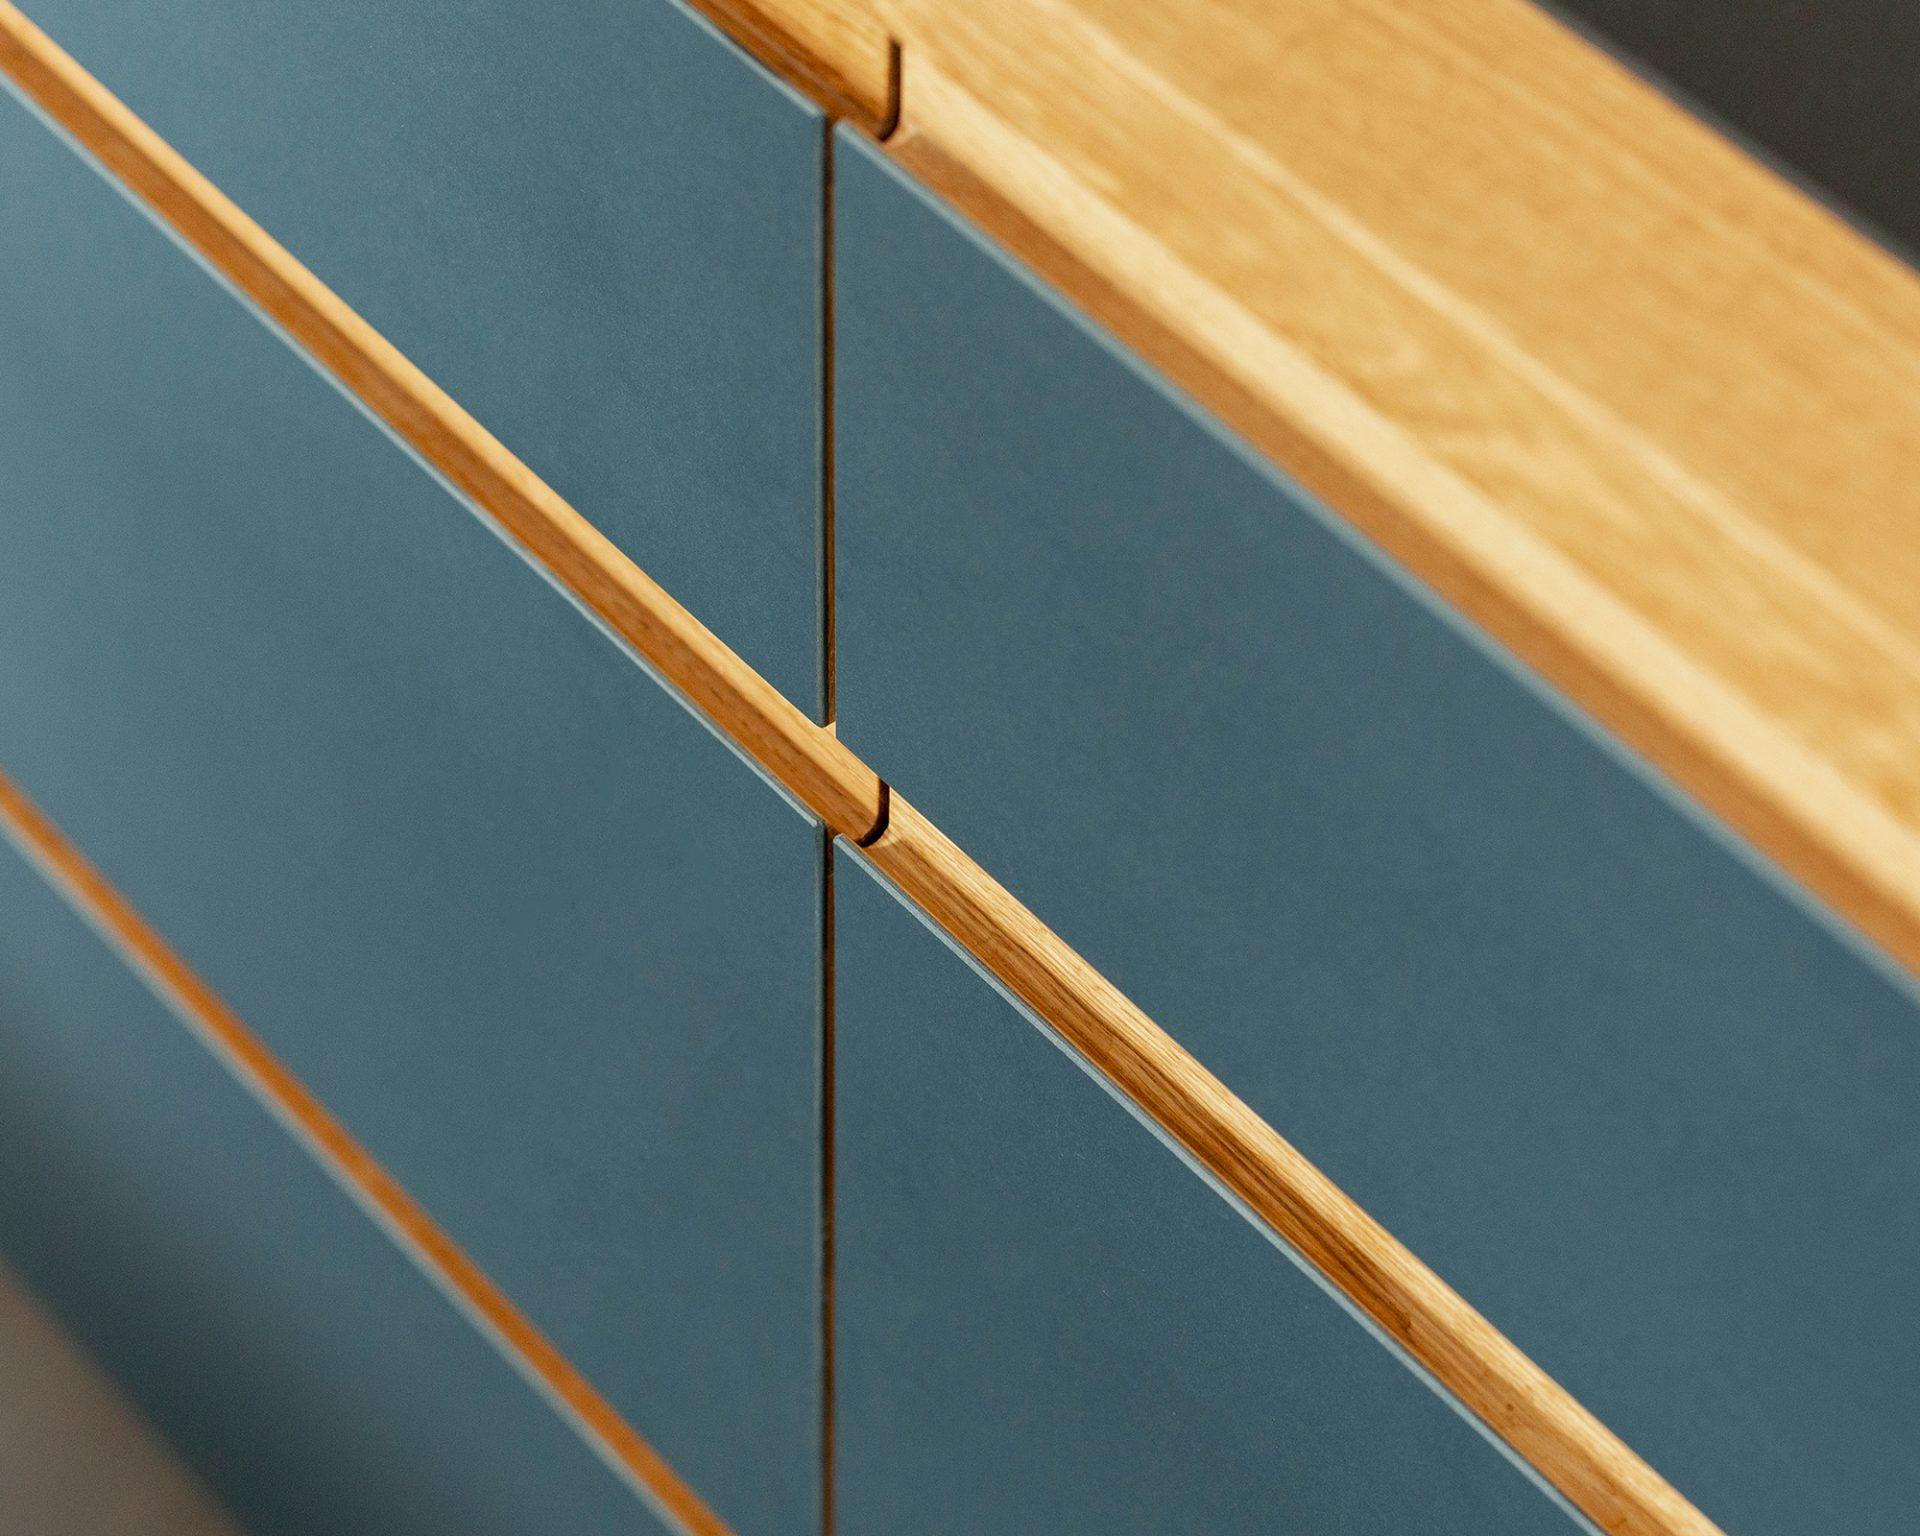 drawers linoleum blue